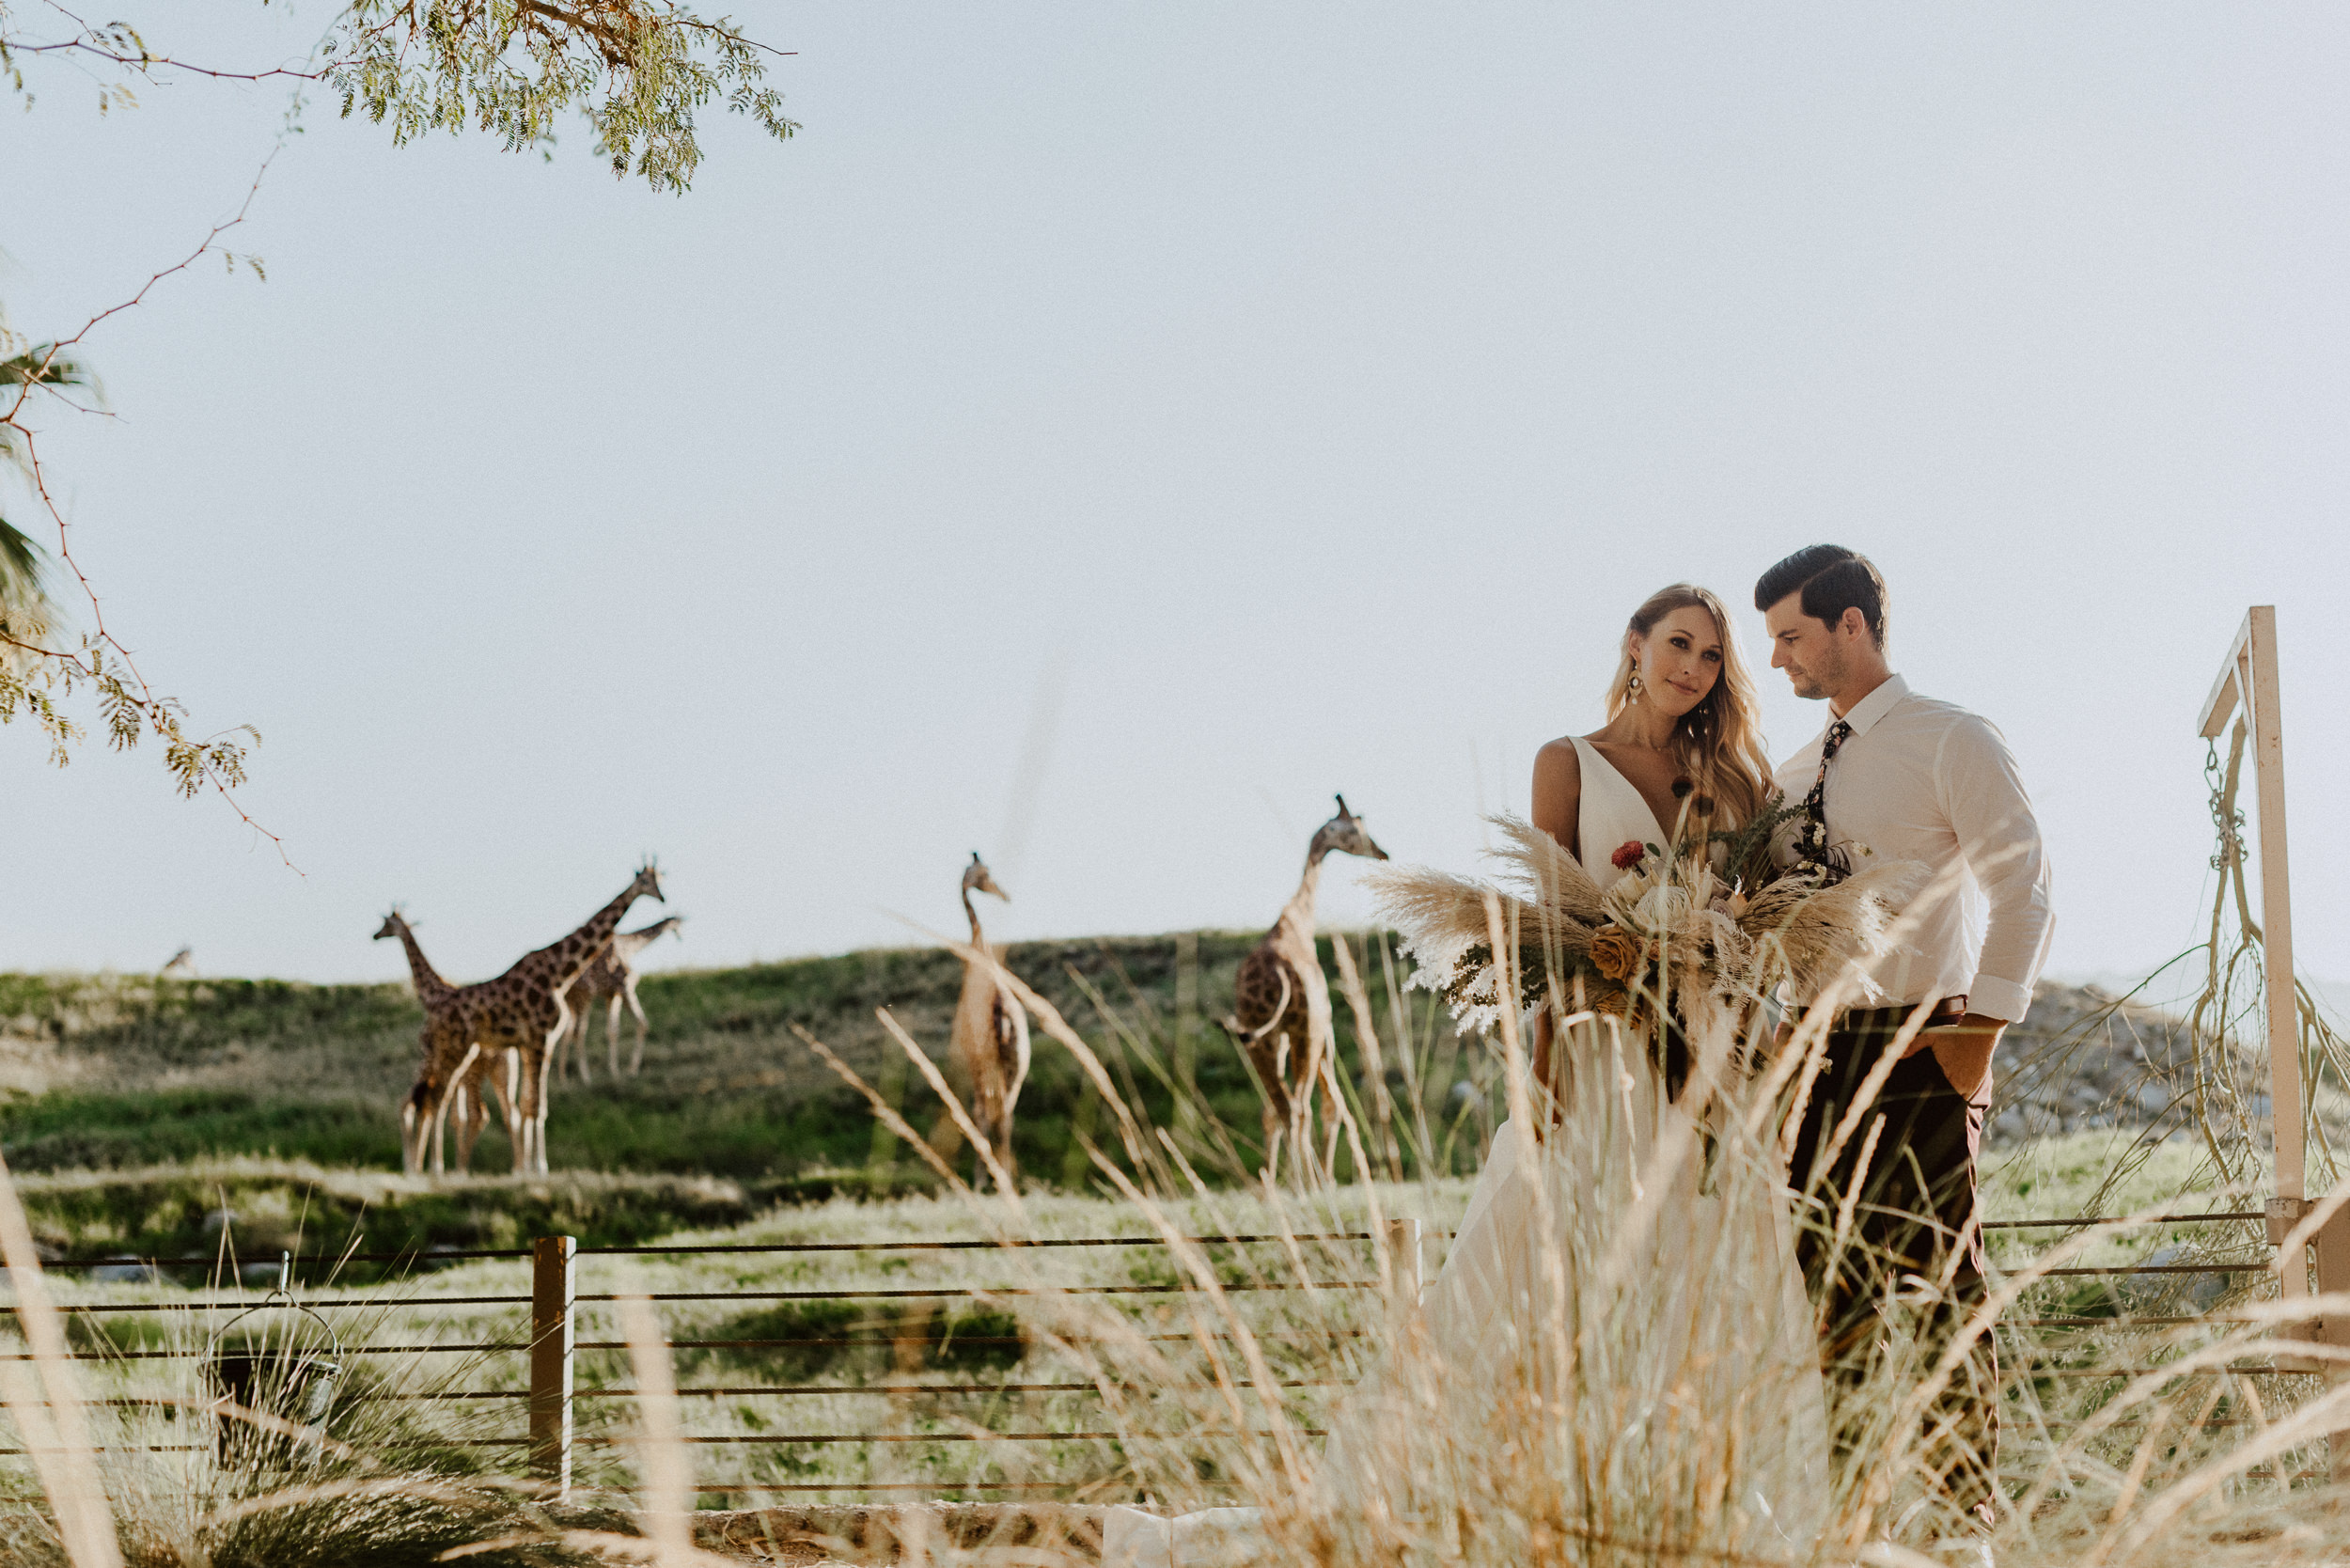 sChelsie + Chris - The Desert Shootout Wedding Romantics at The Living Desert-71.jpg